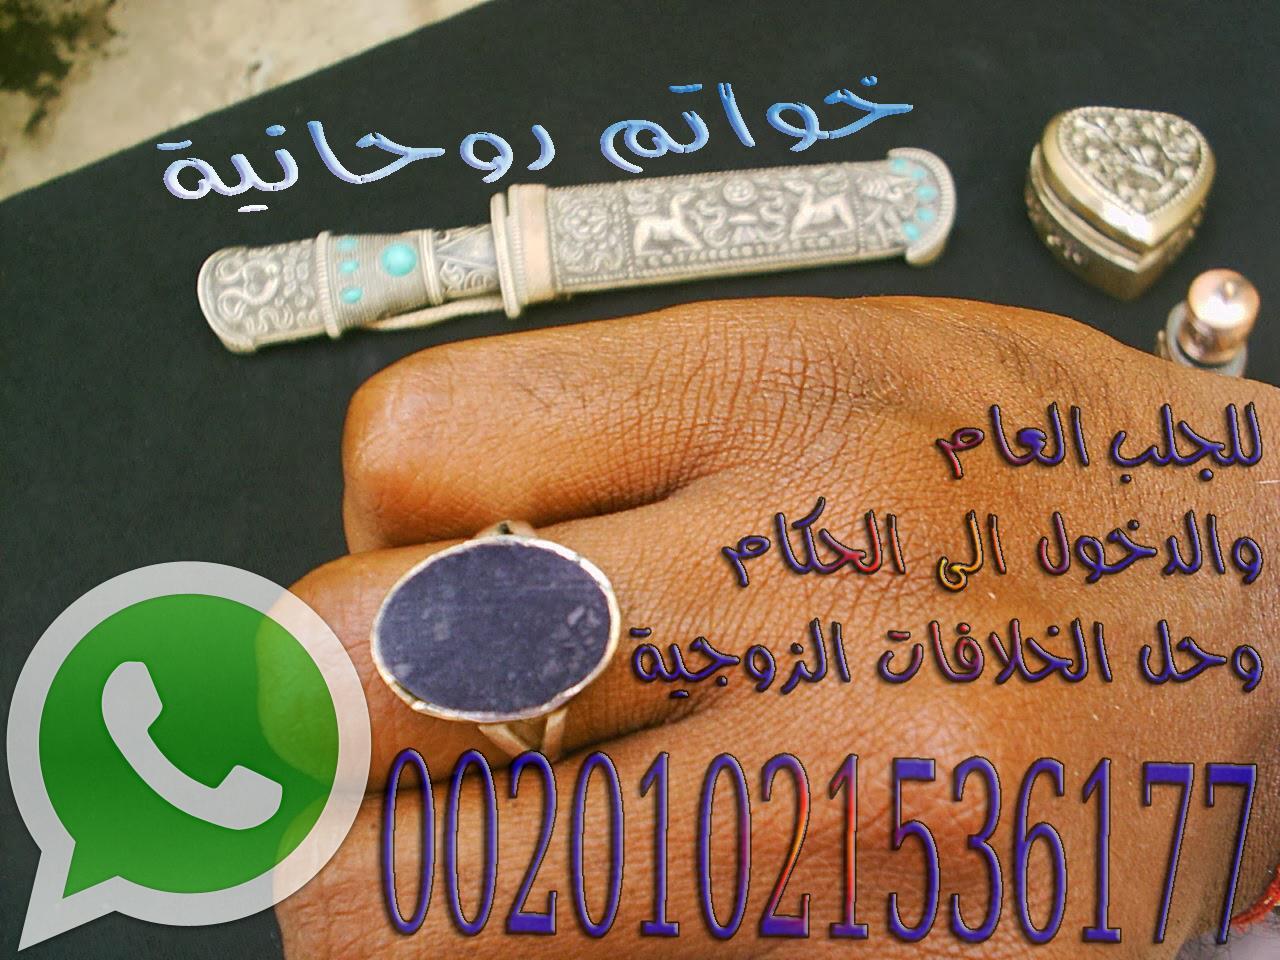 مضمون00201021536177 123541517.jpg